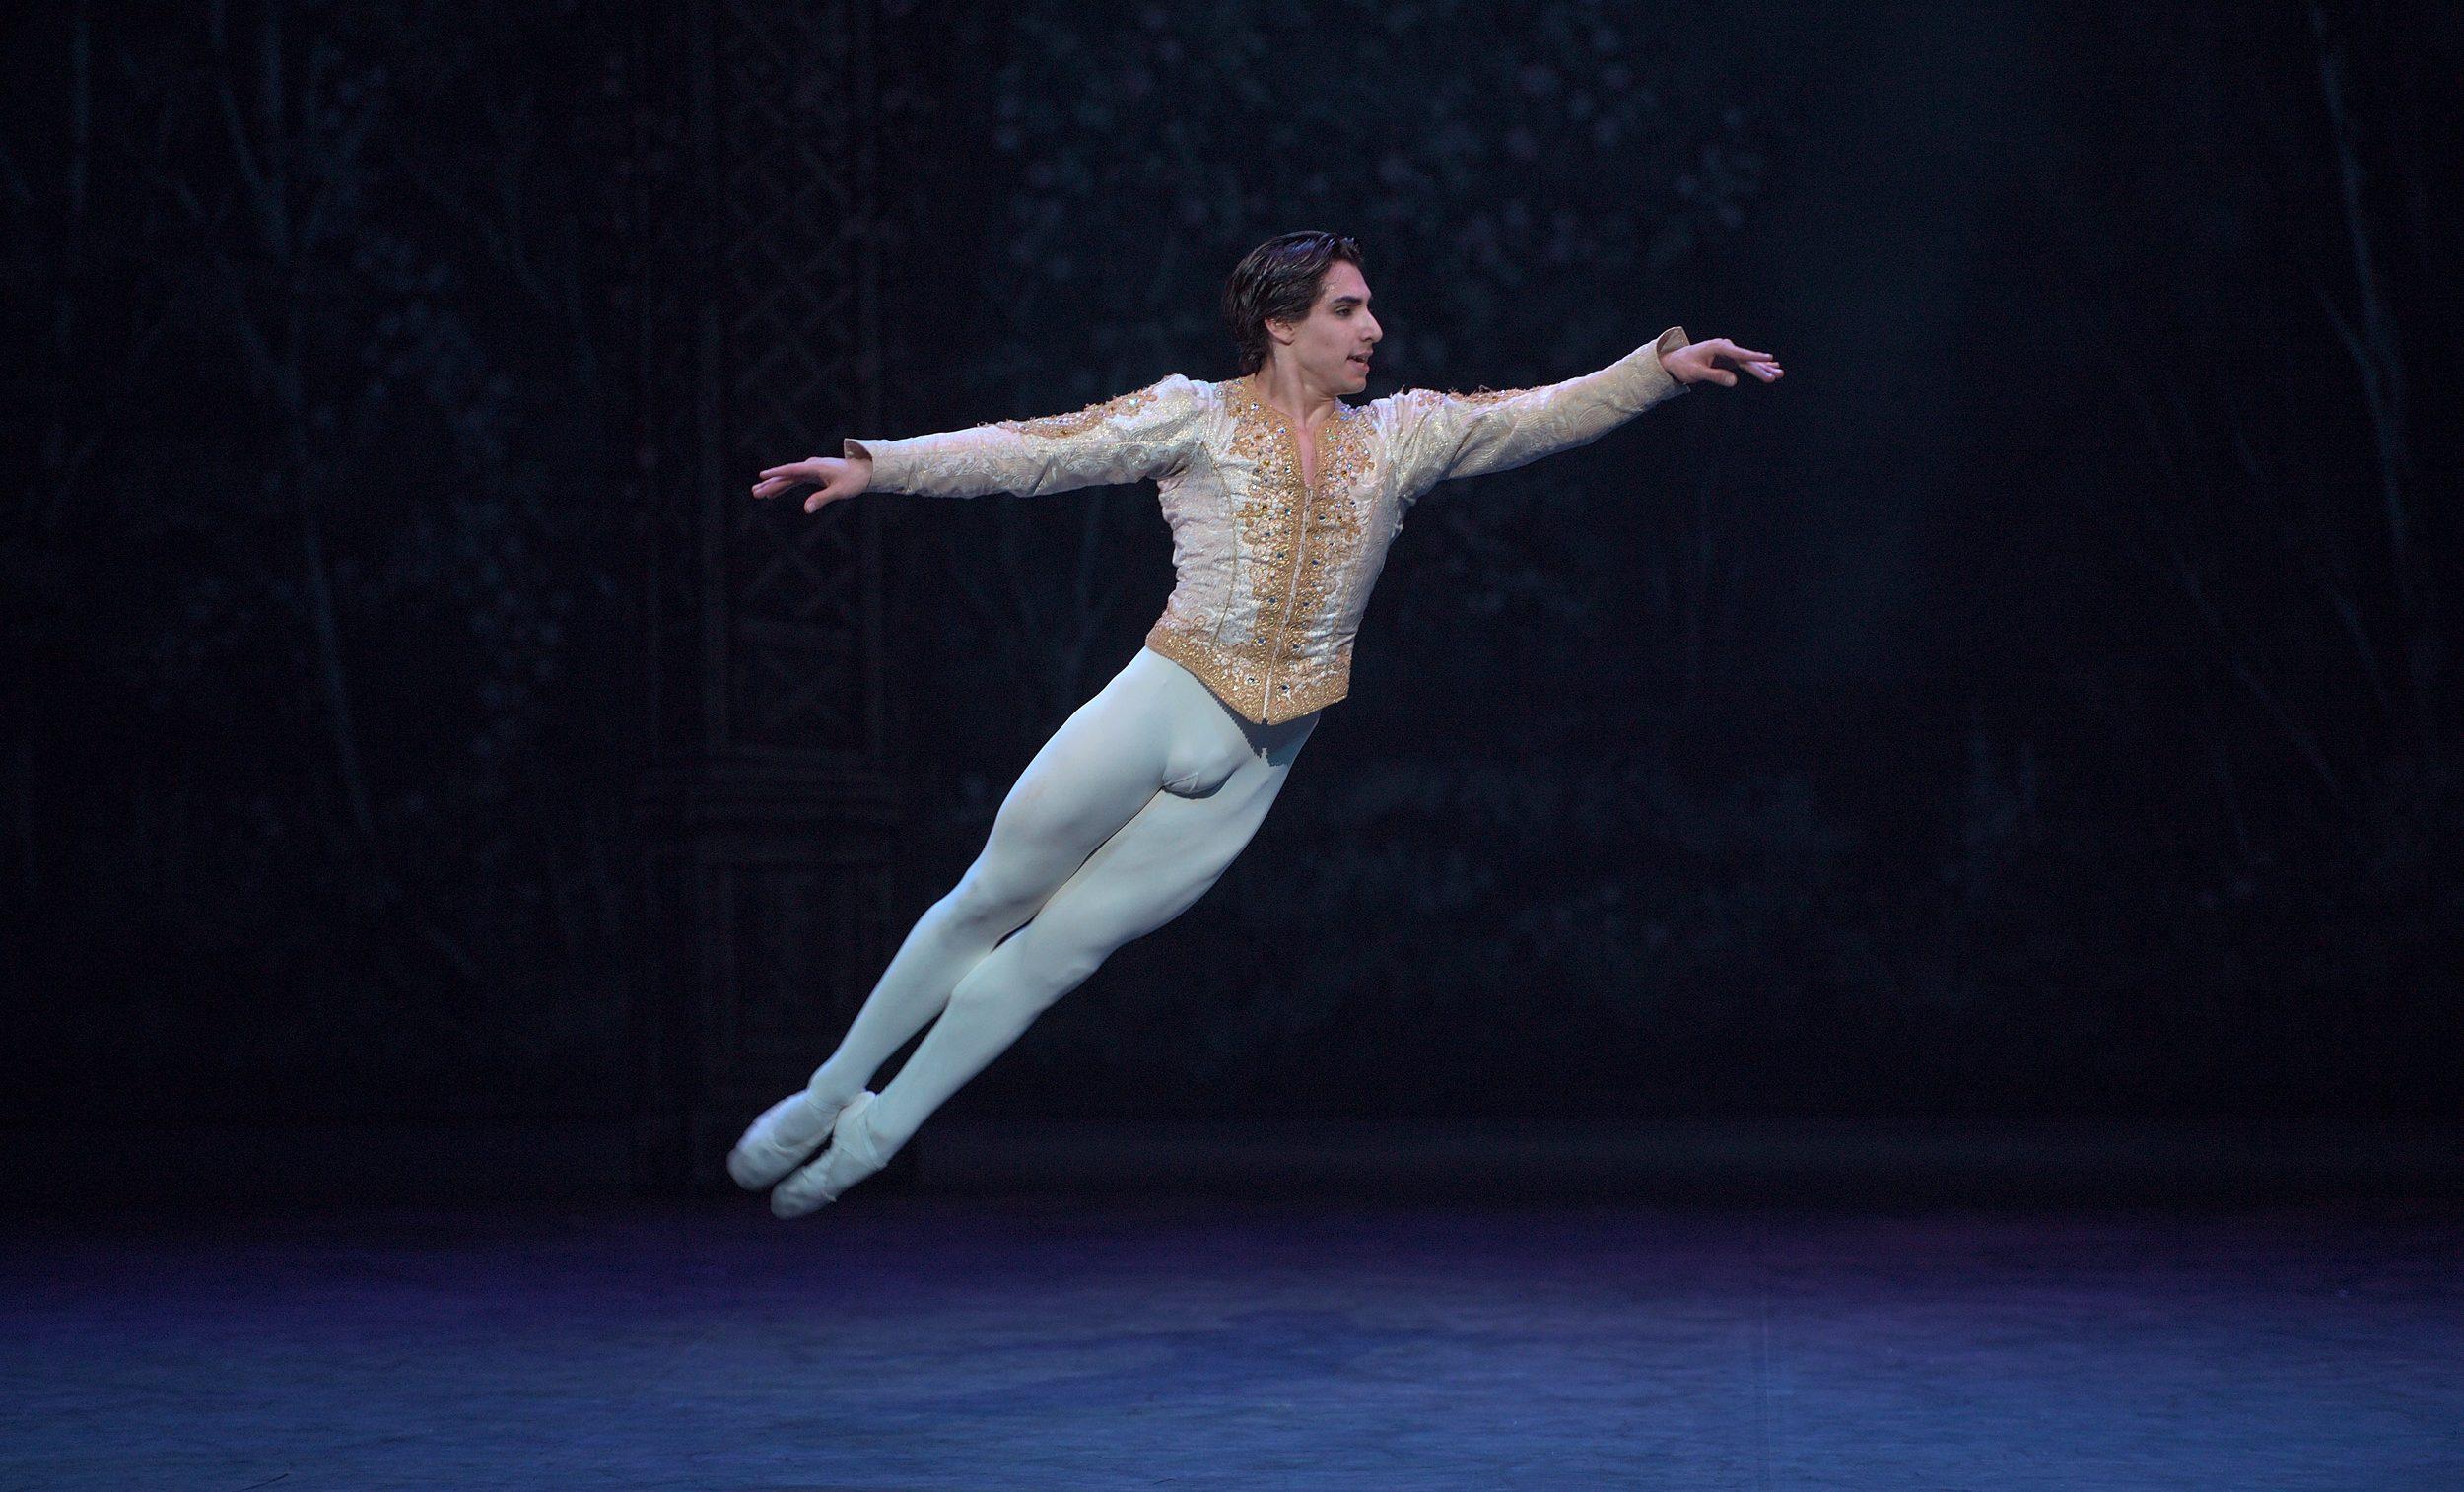 Cesar-Corrales-in-English-National-Ballet's-Nutcracker-(C)-Laurent-Liotardo-(2)-2500px-for-web